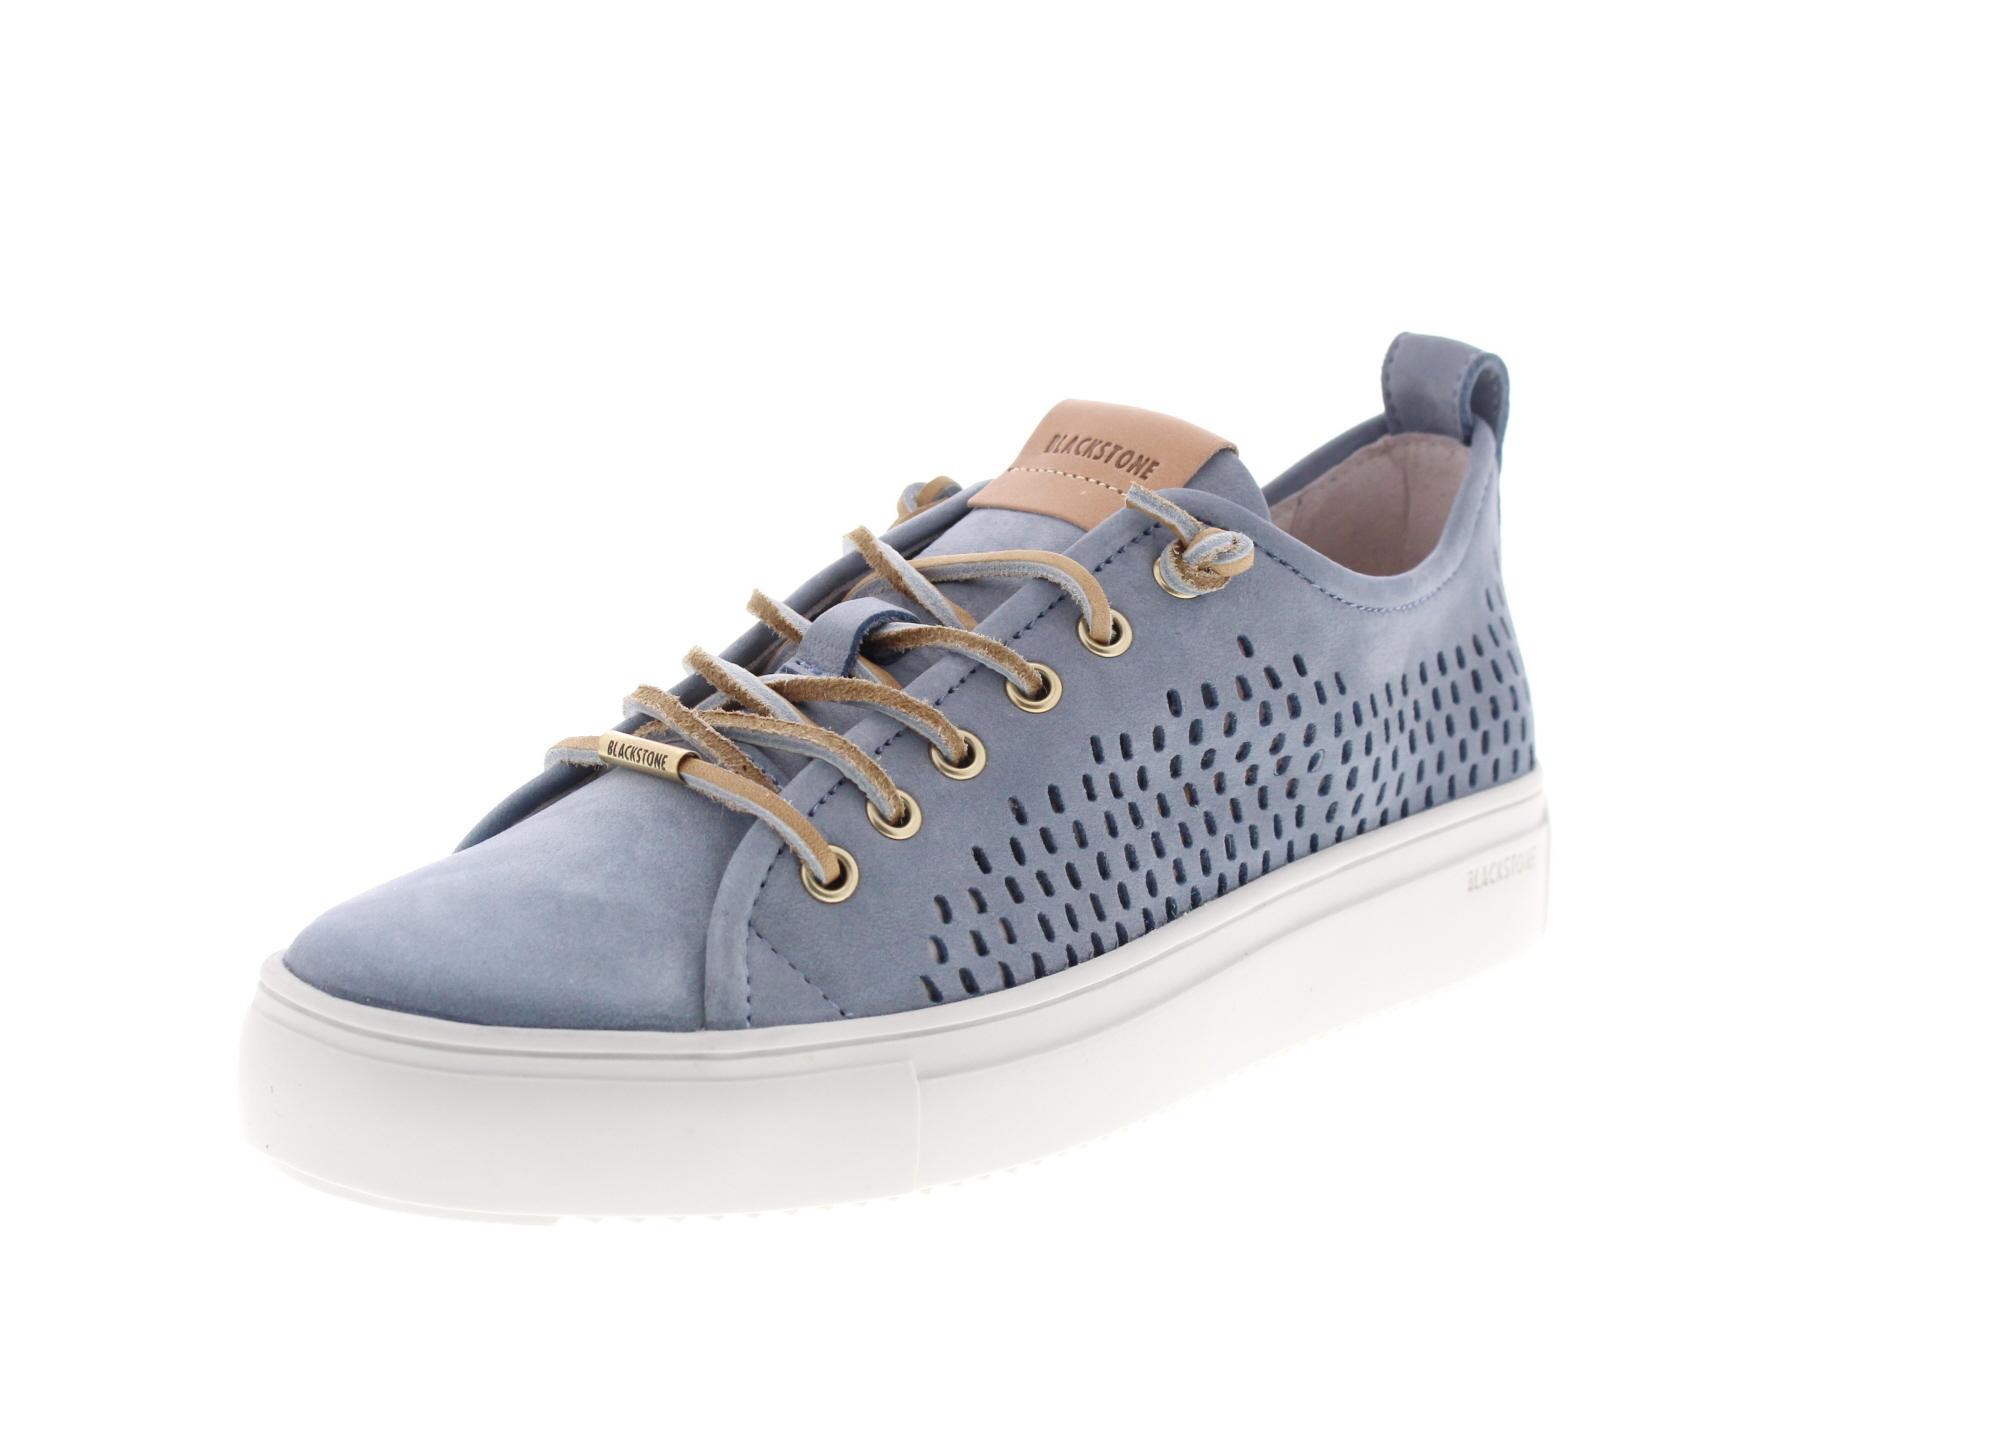 BLACKSTONE Damenschuhe - Sneakers PL87 - winter sky_0